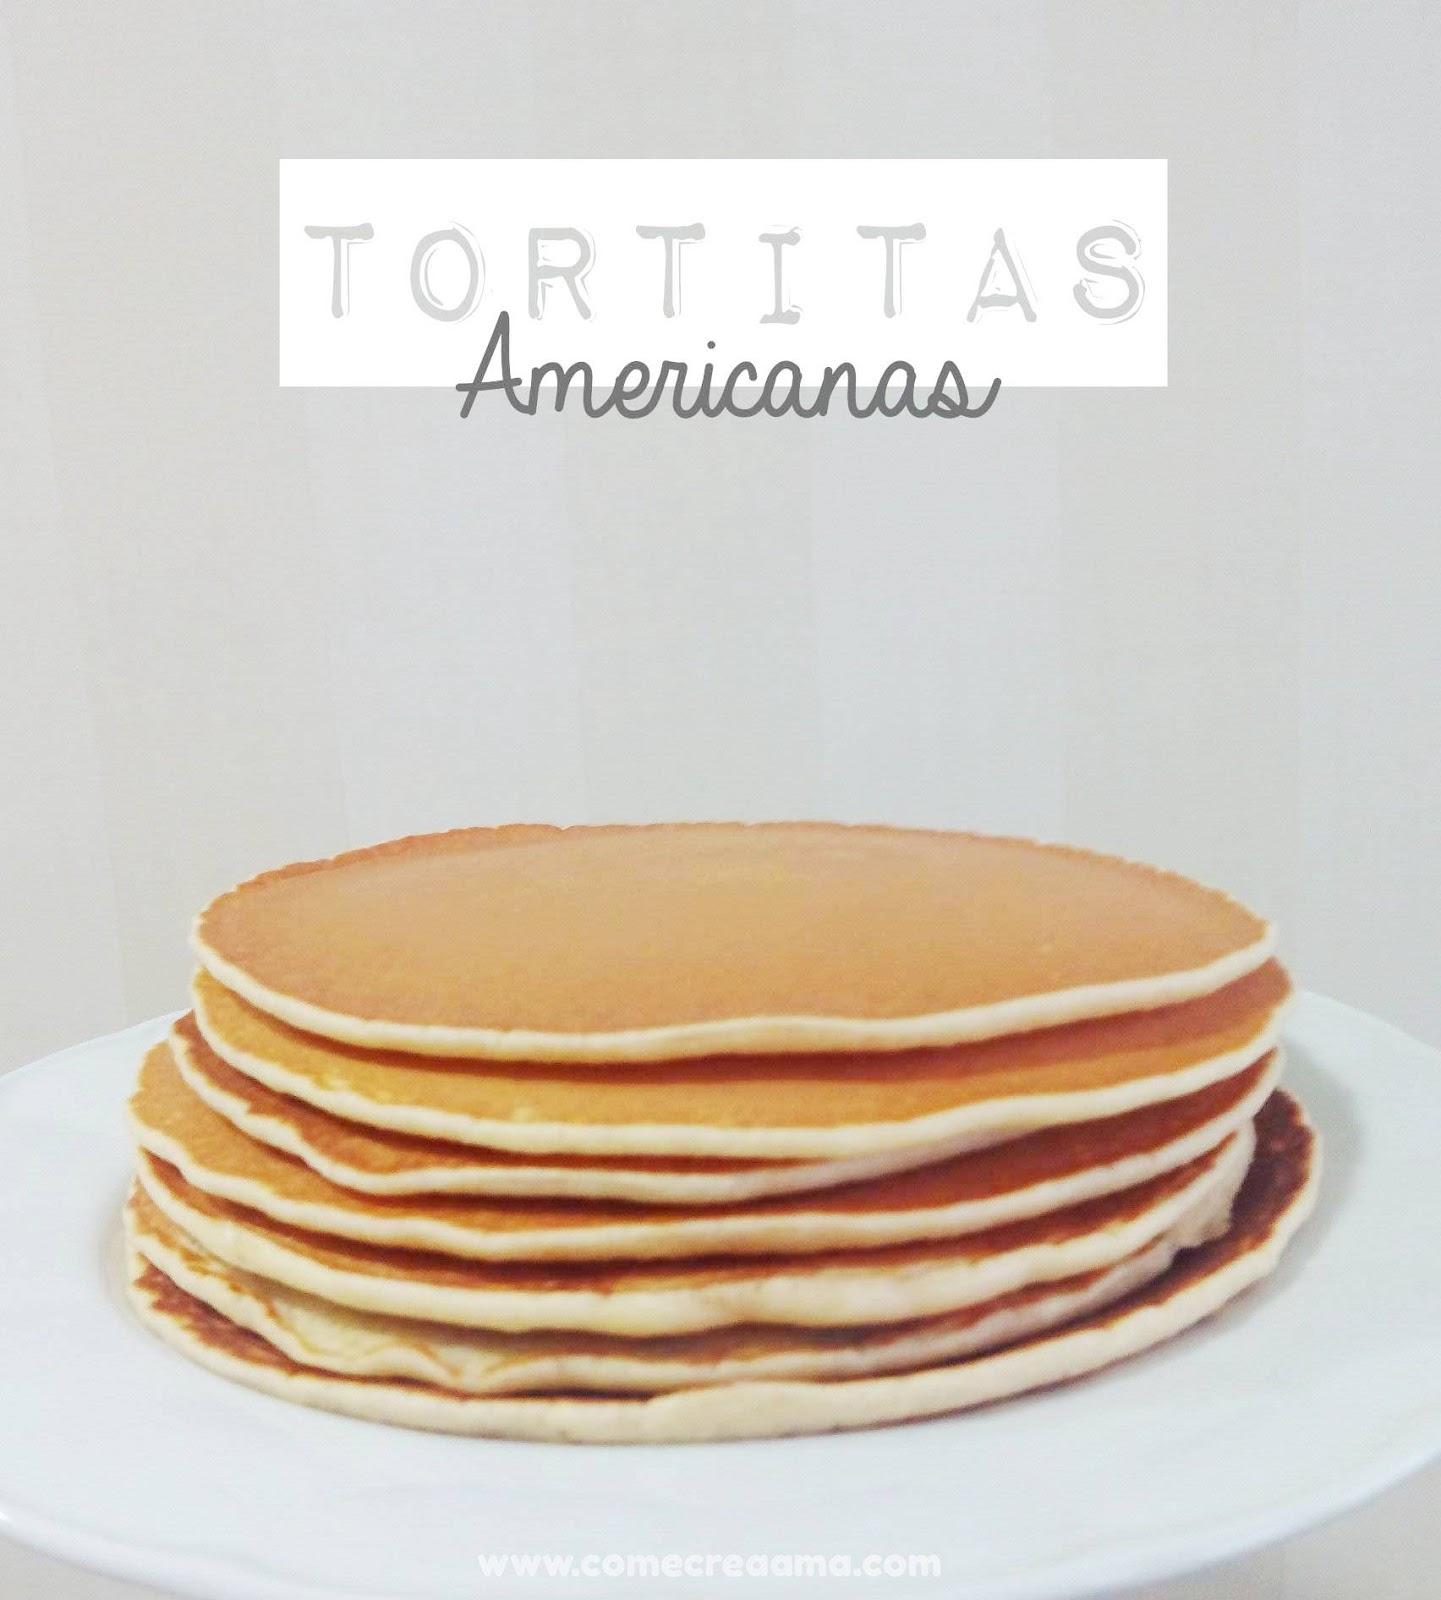 Imagen de tortitas recién hechas